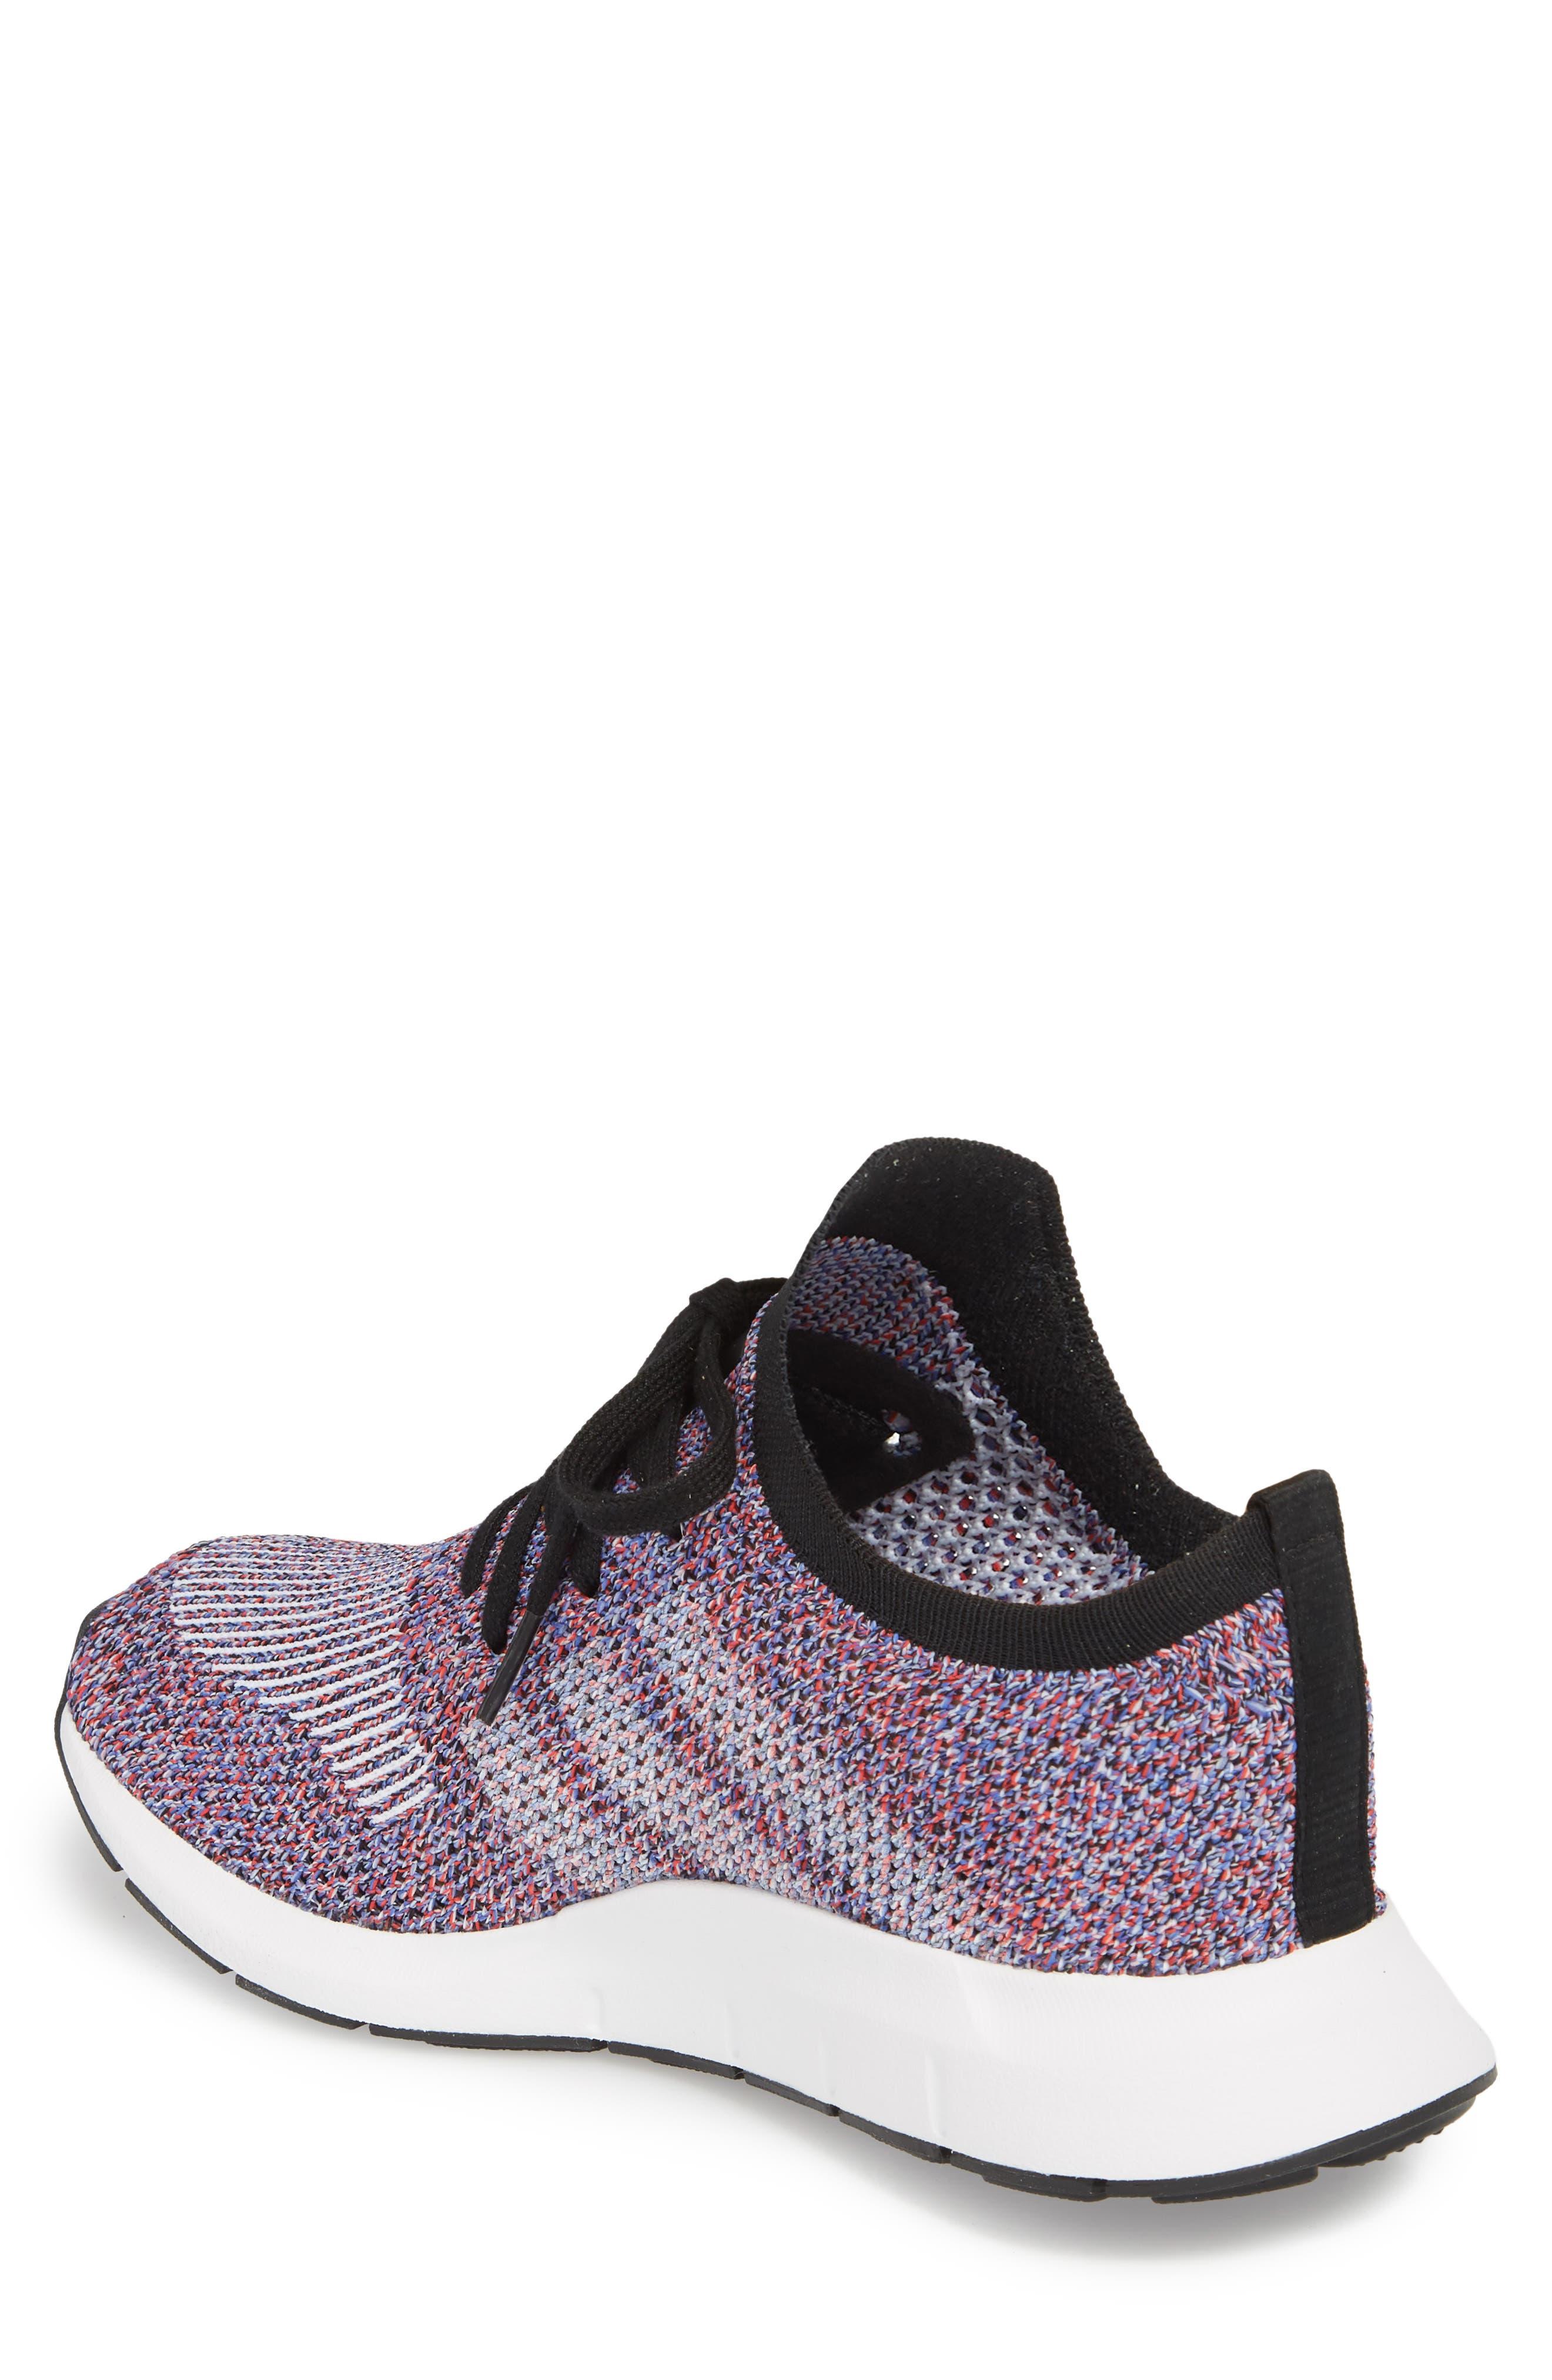 Swift Run Primeknit Sneaker,                             Alternate thumbnail 2, color,                             White/ Purple/ Black